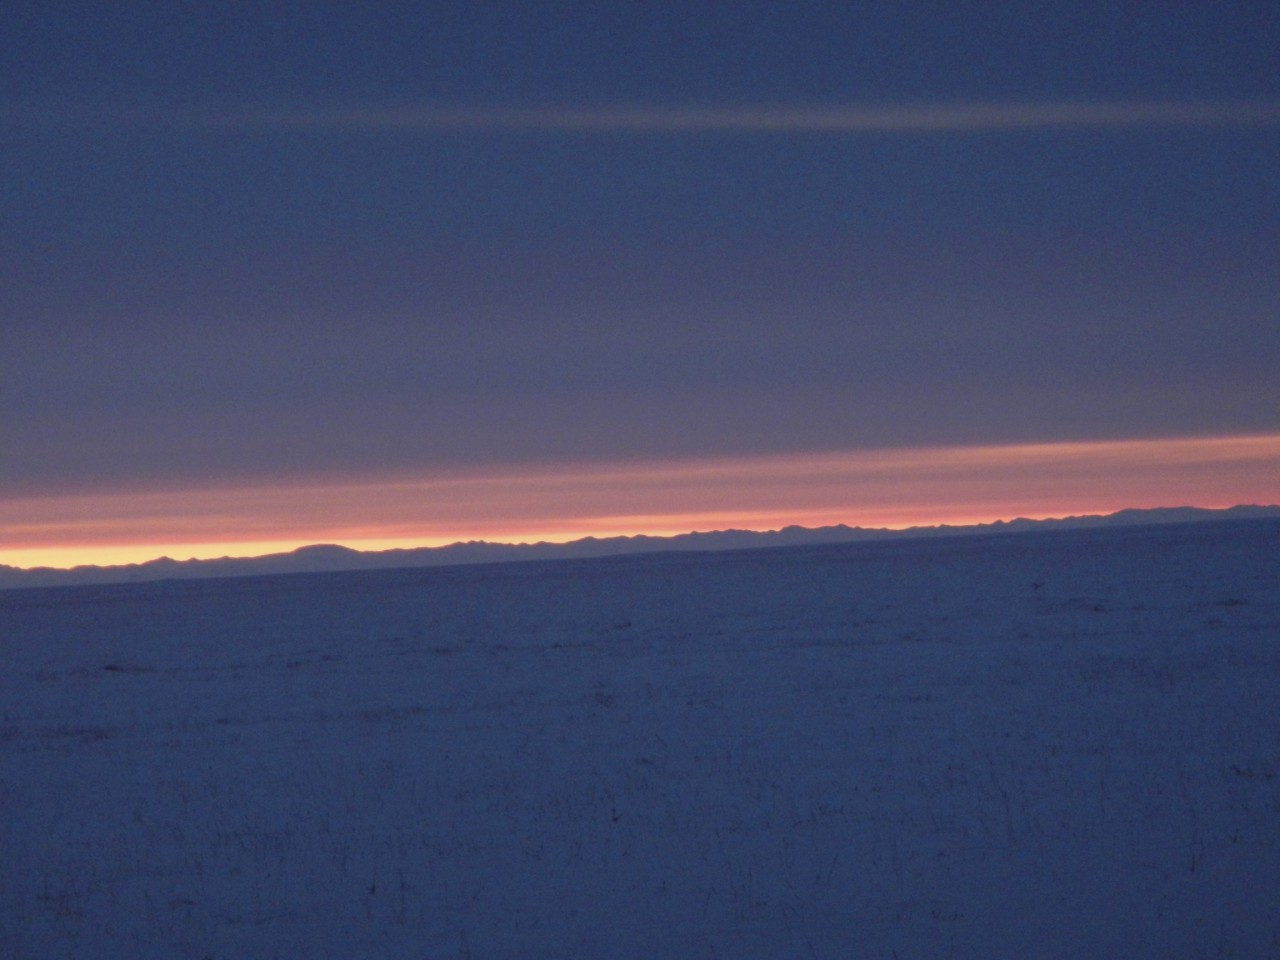 Sunrise in Deadhorse Alaska